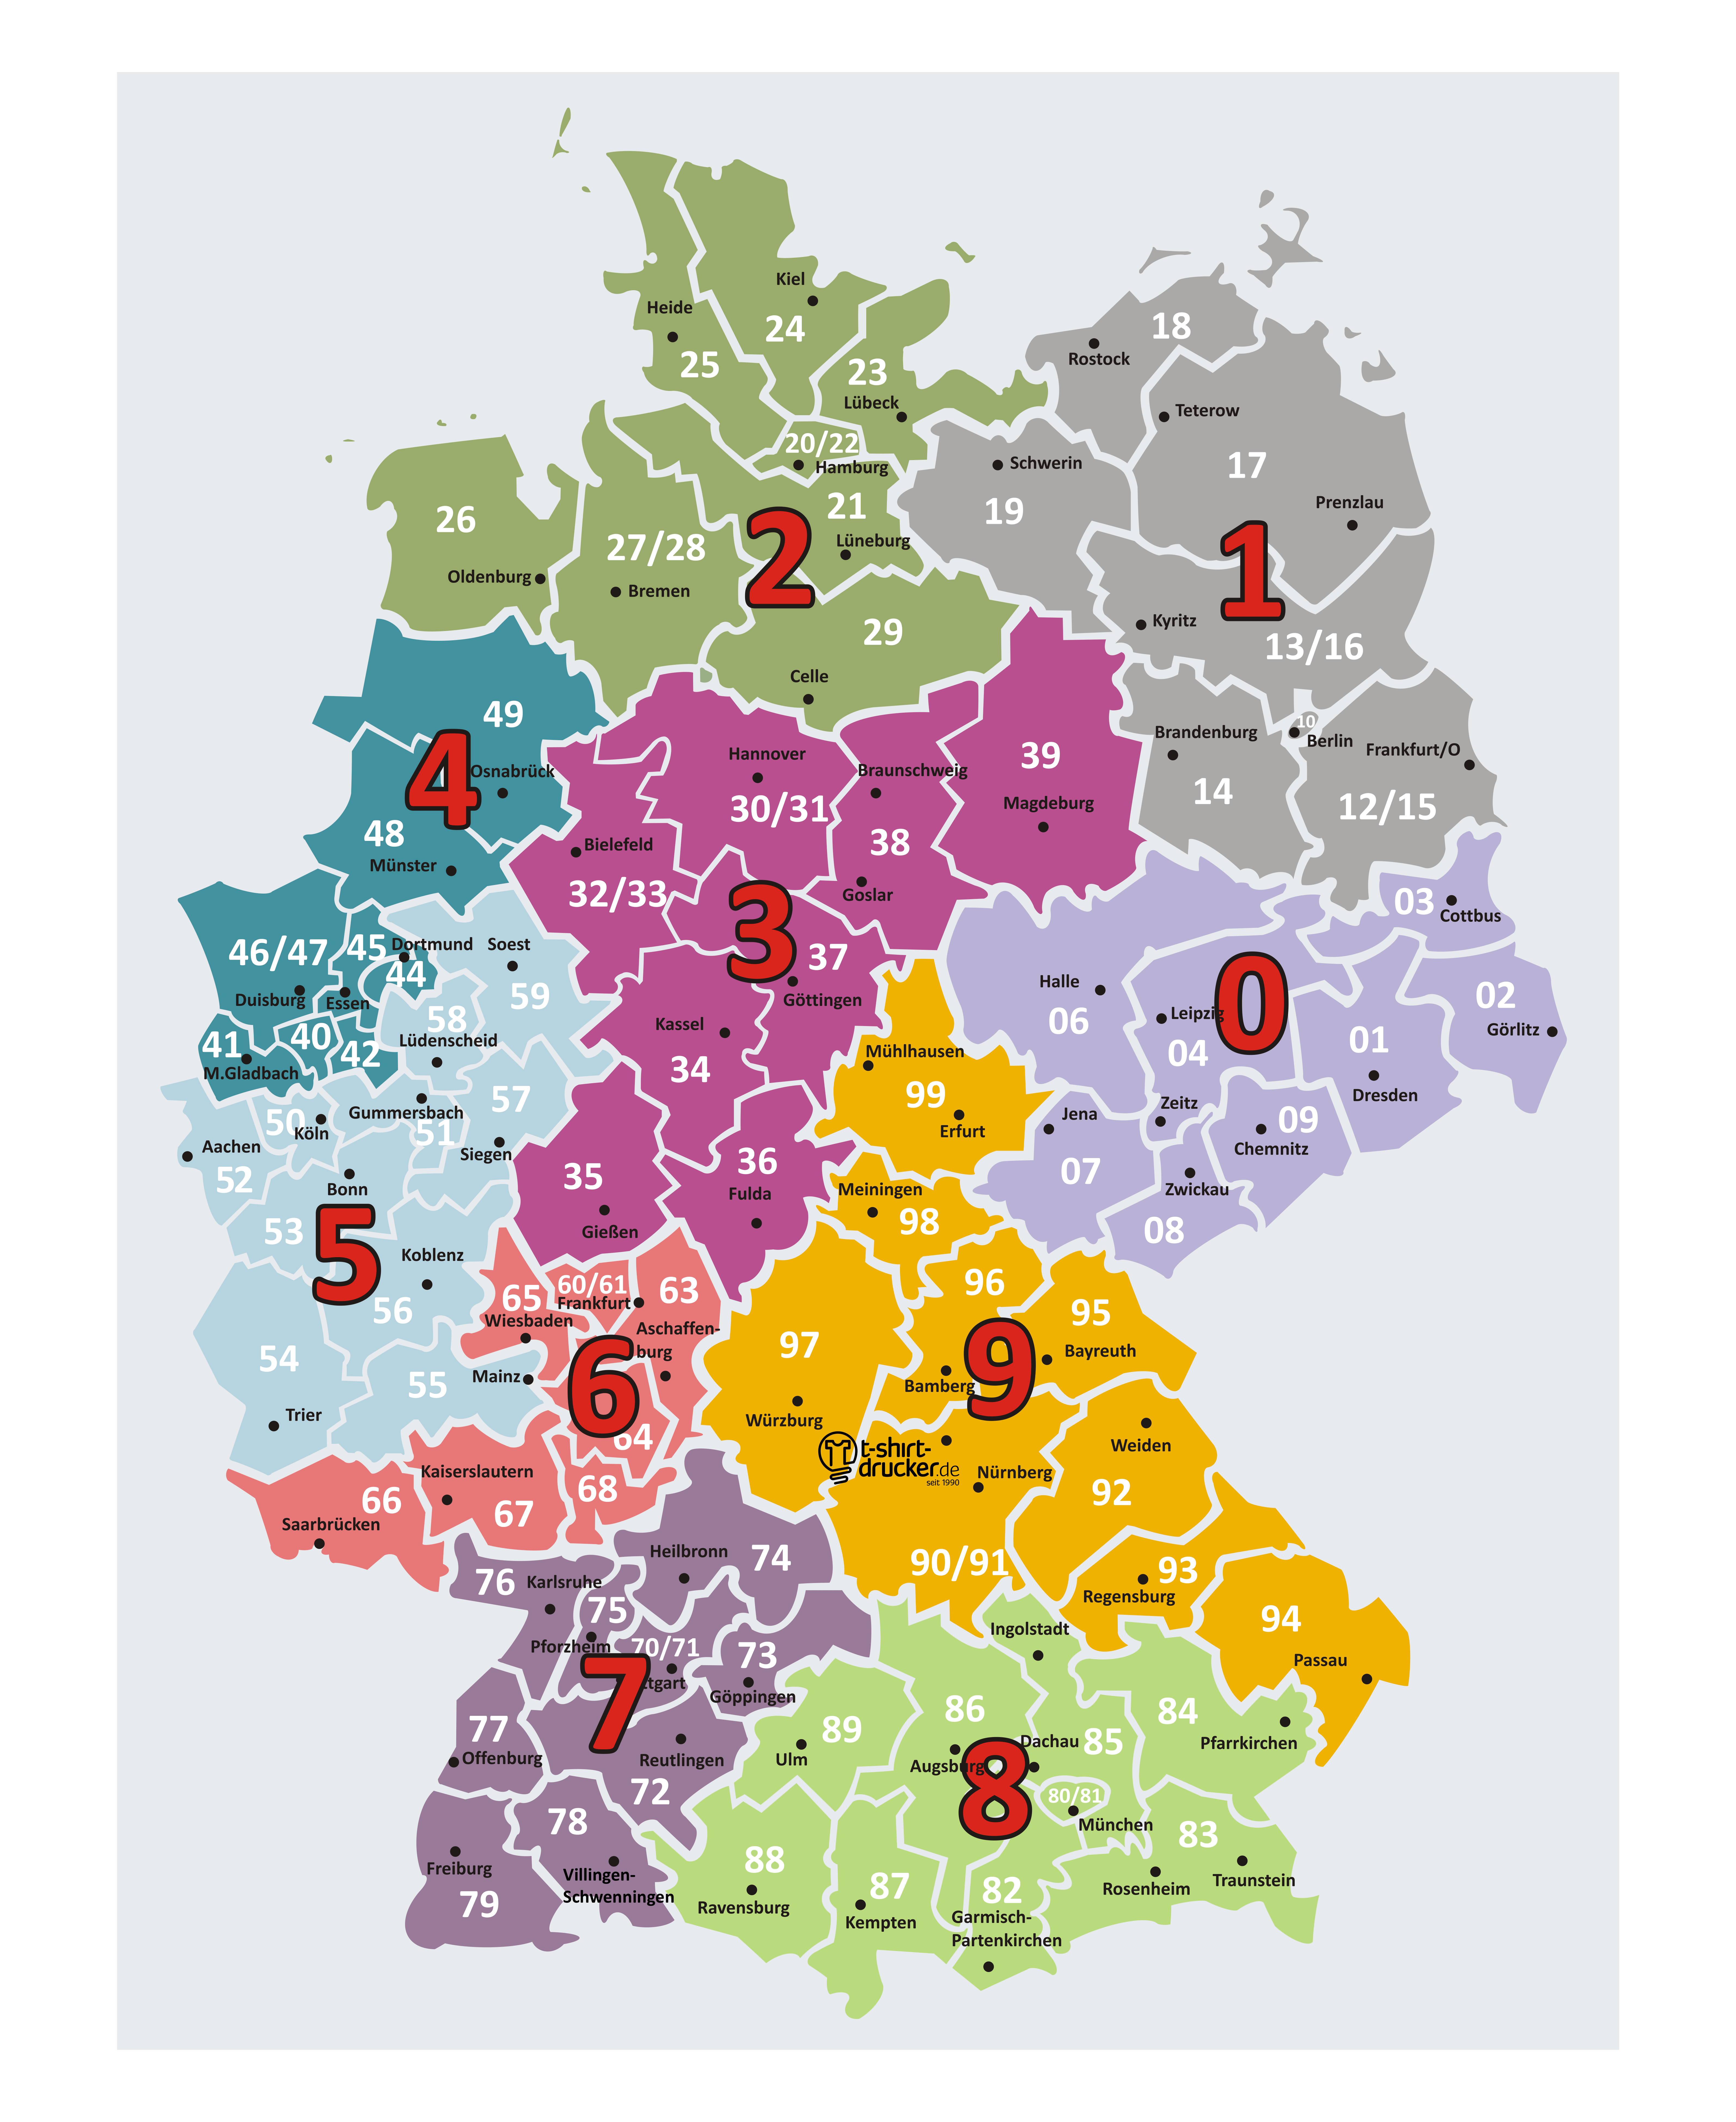 deutsche plz karte Postleitzahlen Karte / PLZ Karte › venue mag